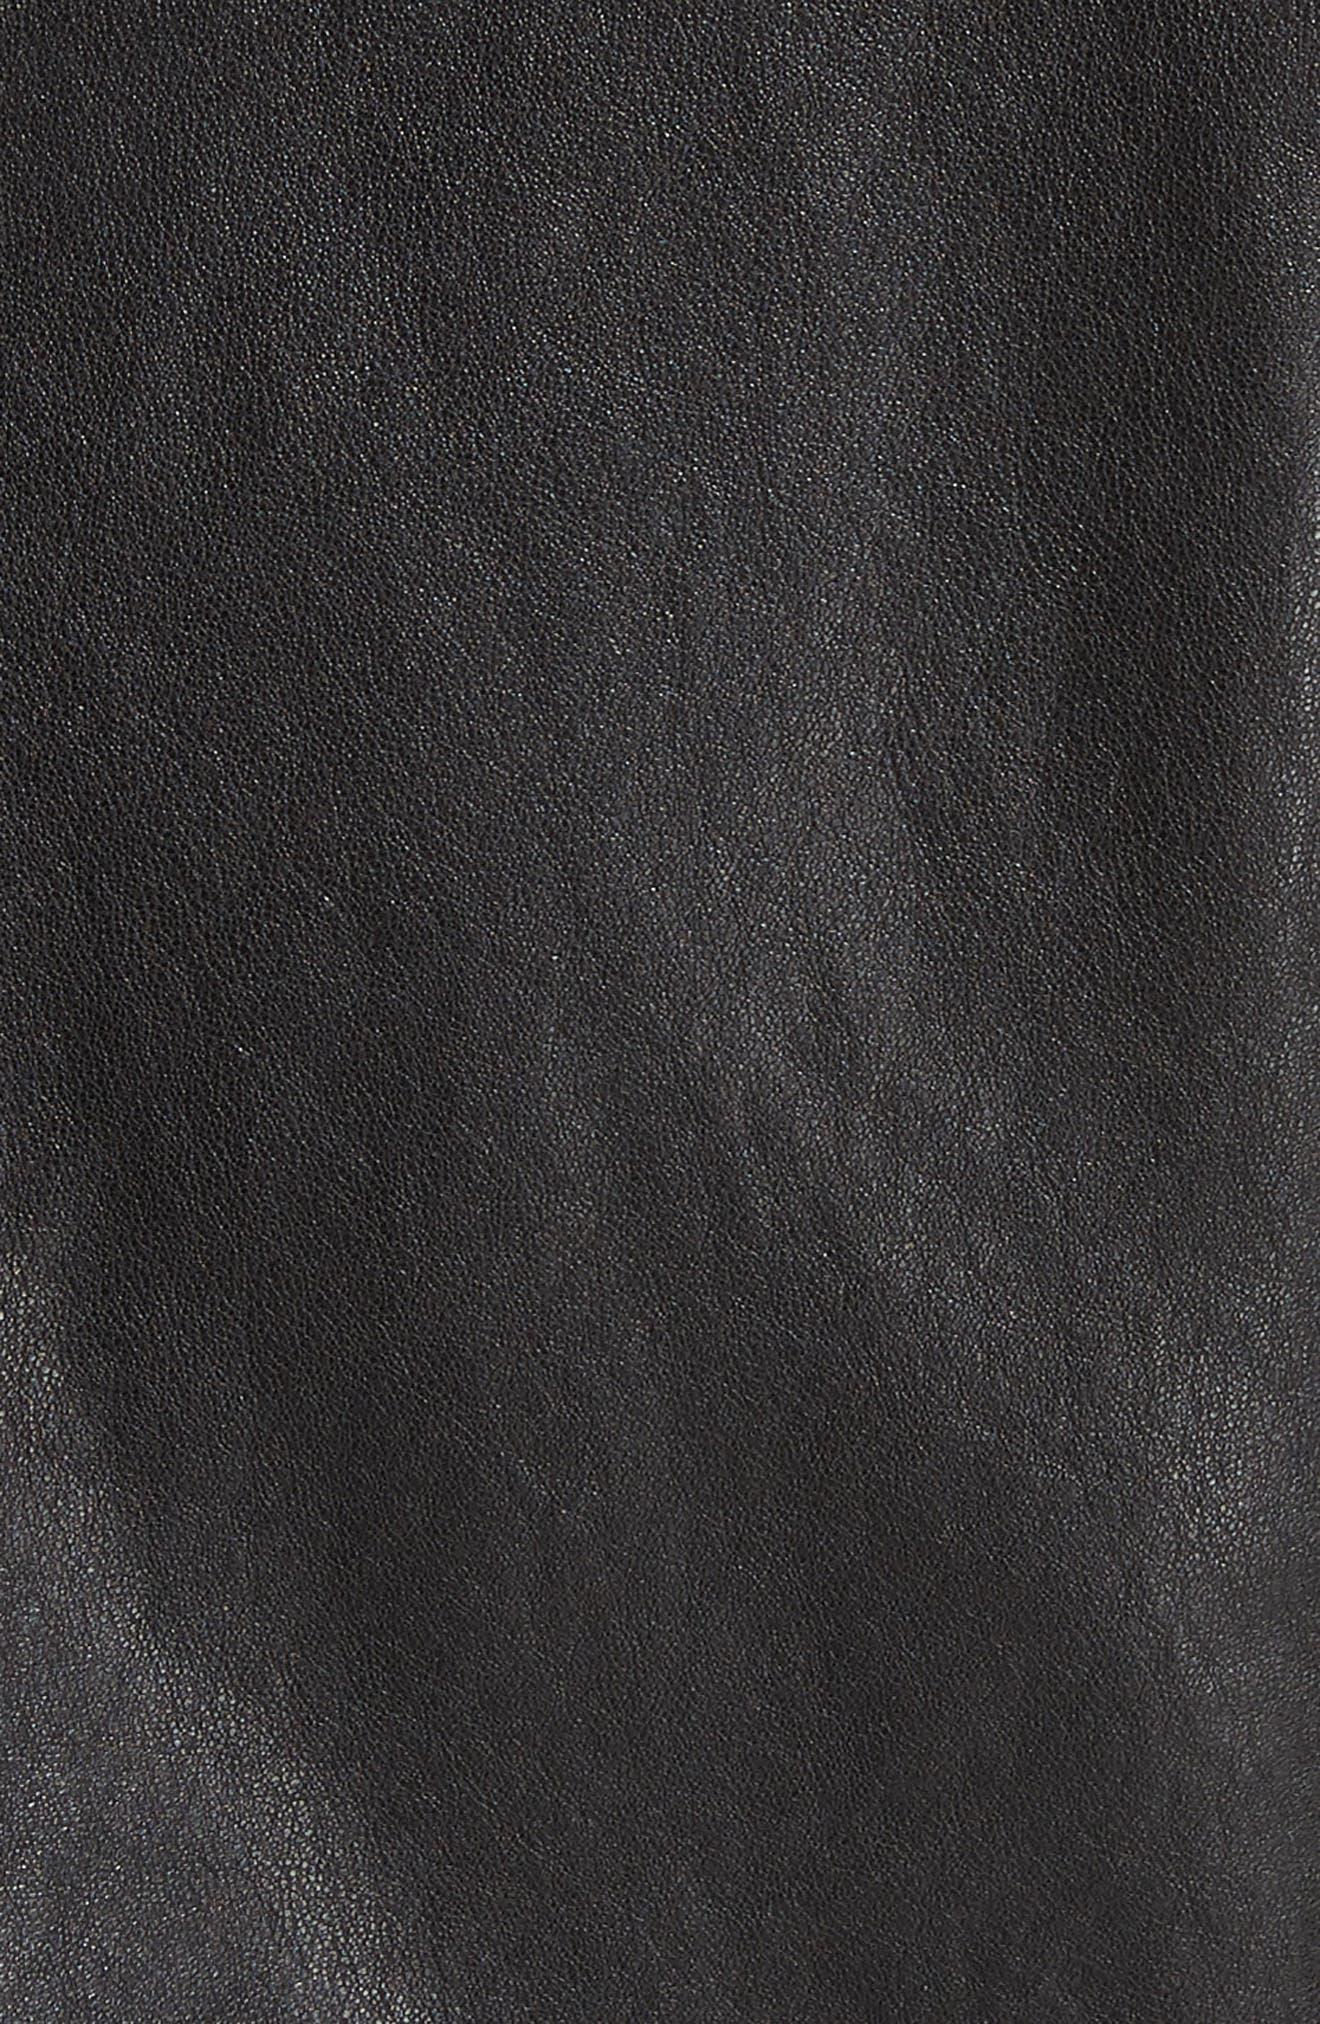 Slim Fit Leather Jacket,                             Alternate thumbnail 6, color,                             001